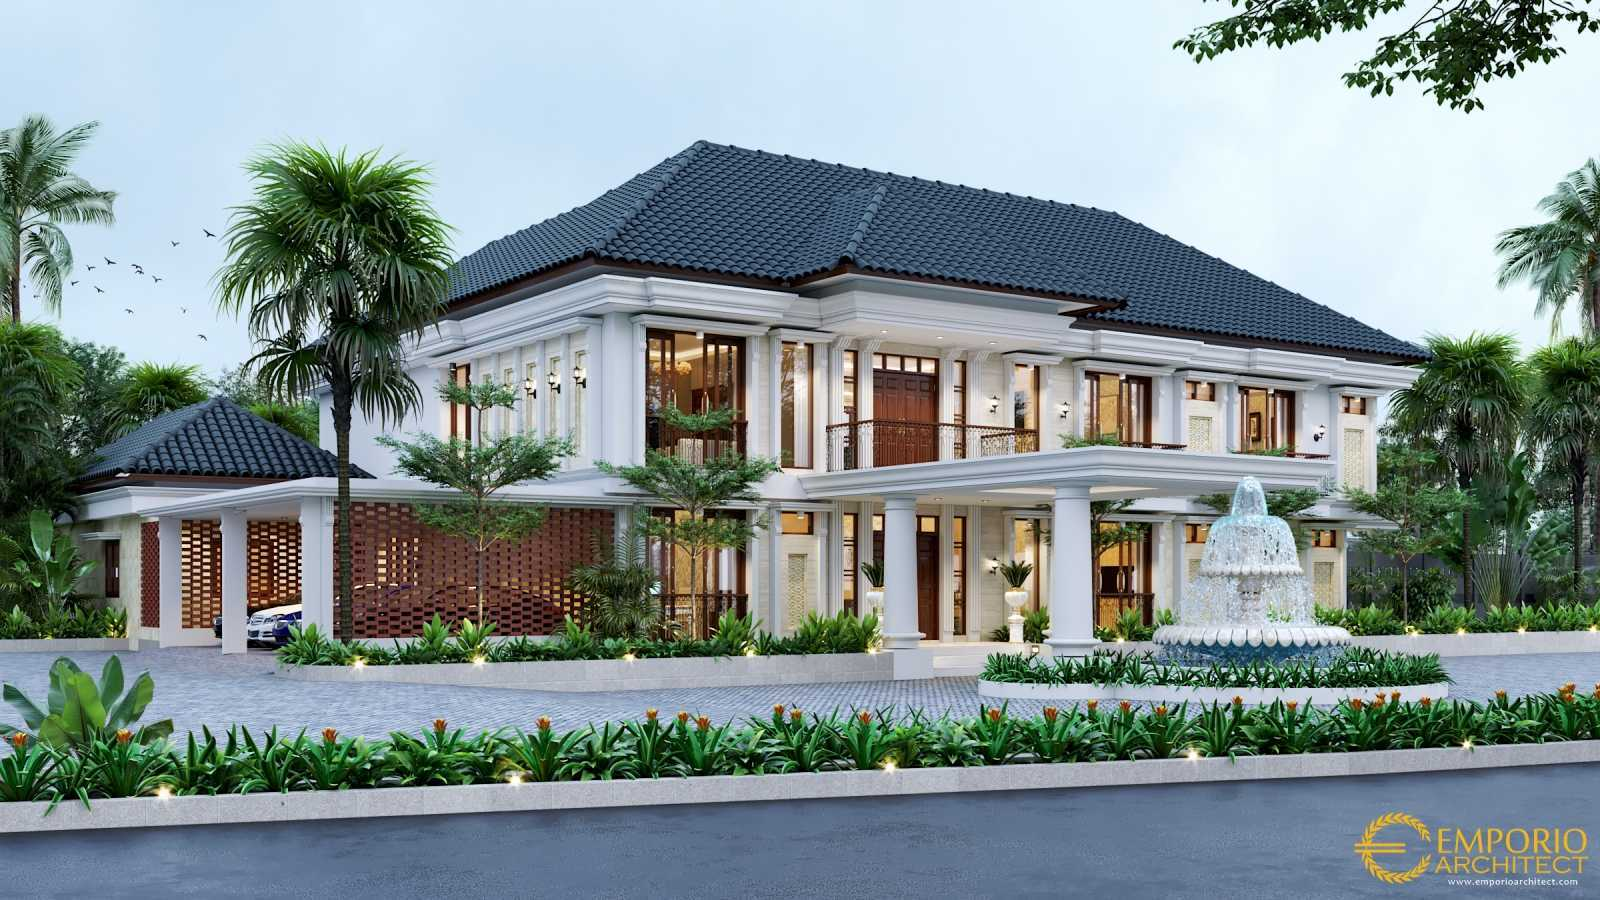 Jasa Arsitek Emporio Architect di Bangka Selatan